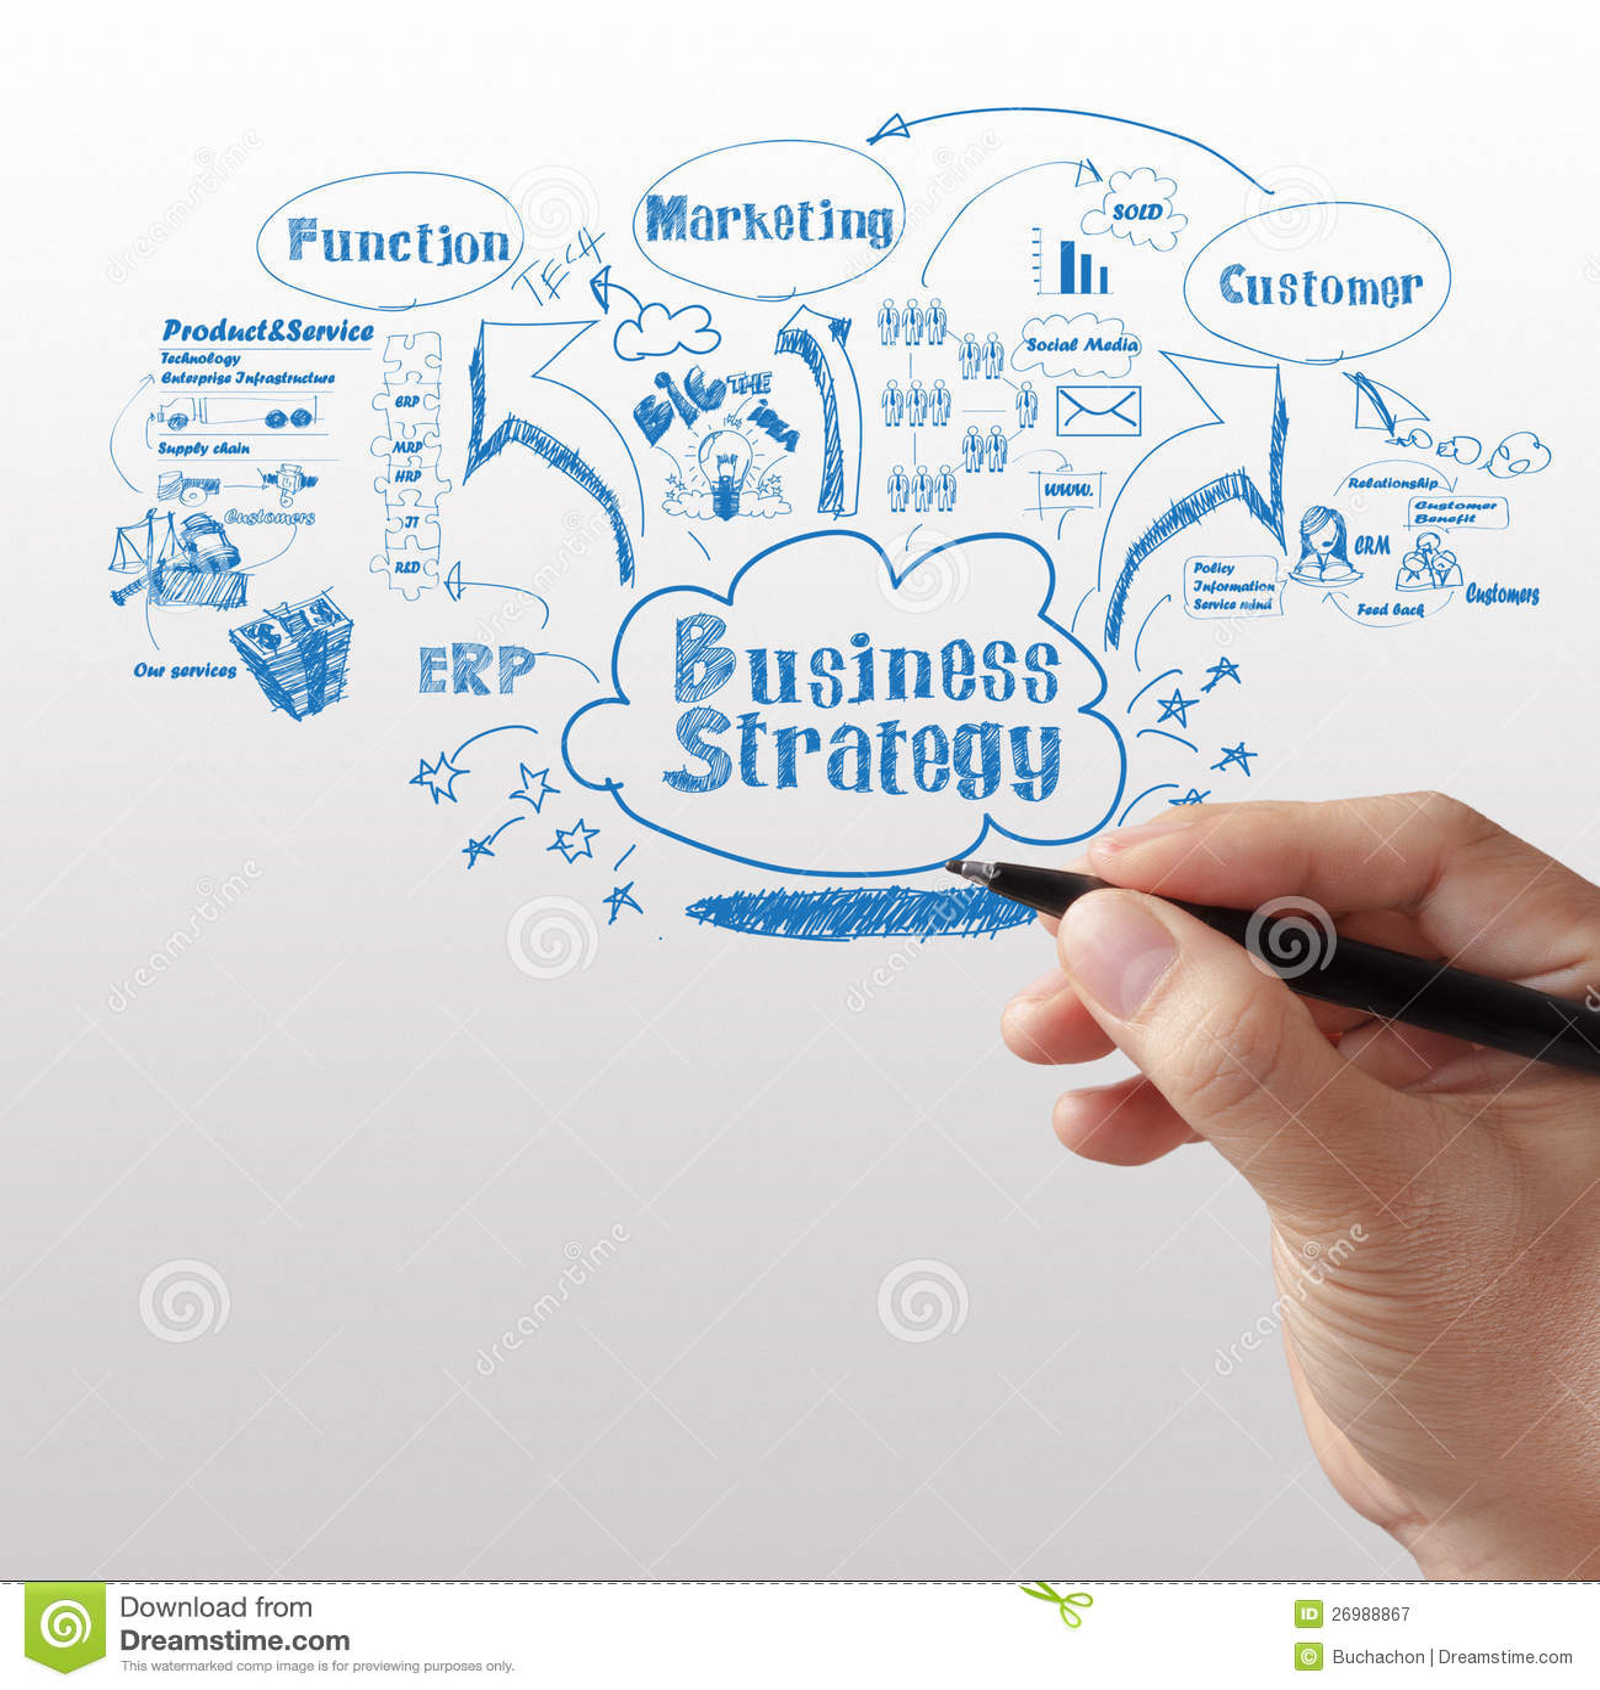 What is strategic business development